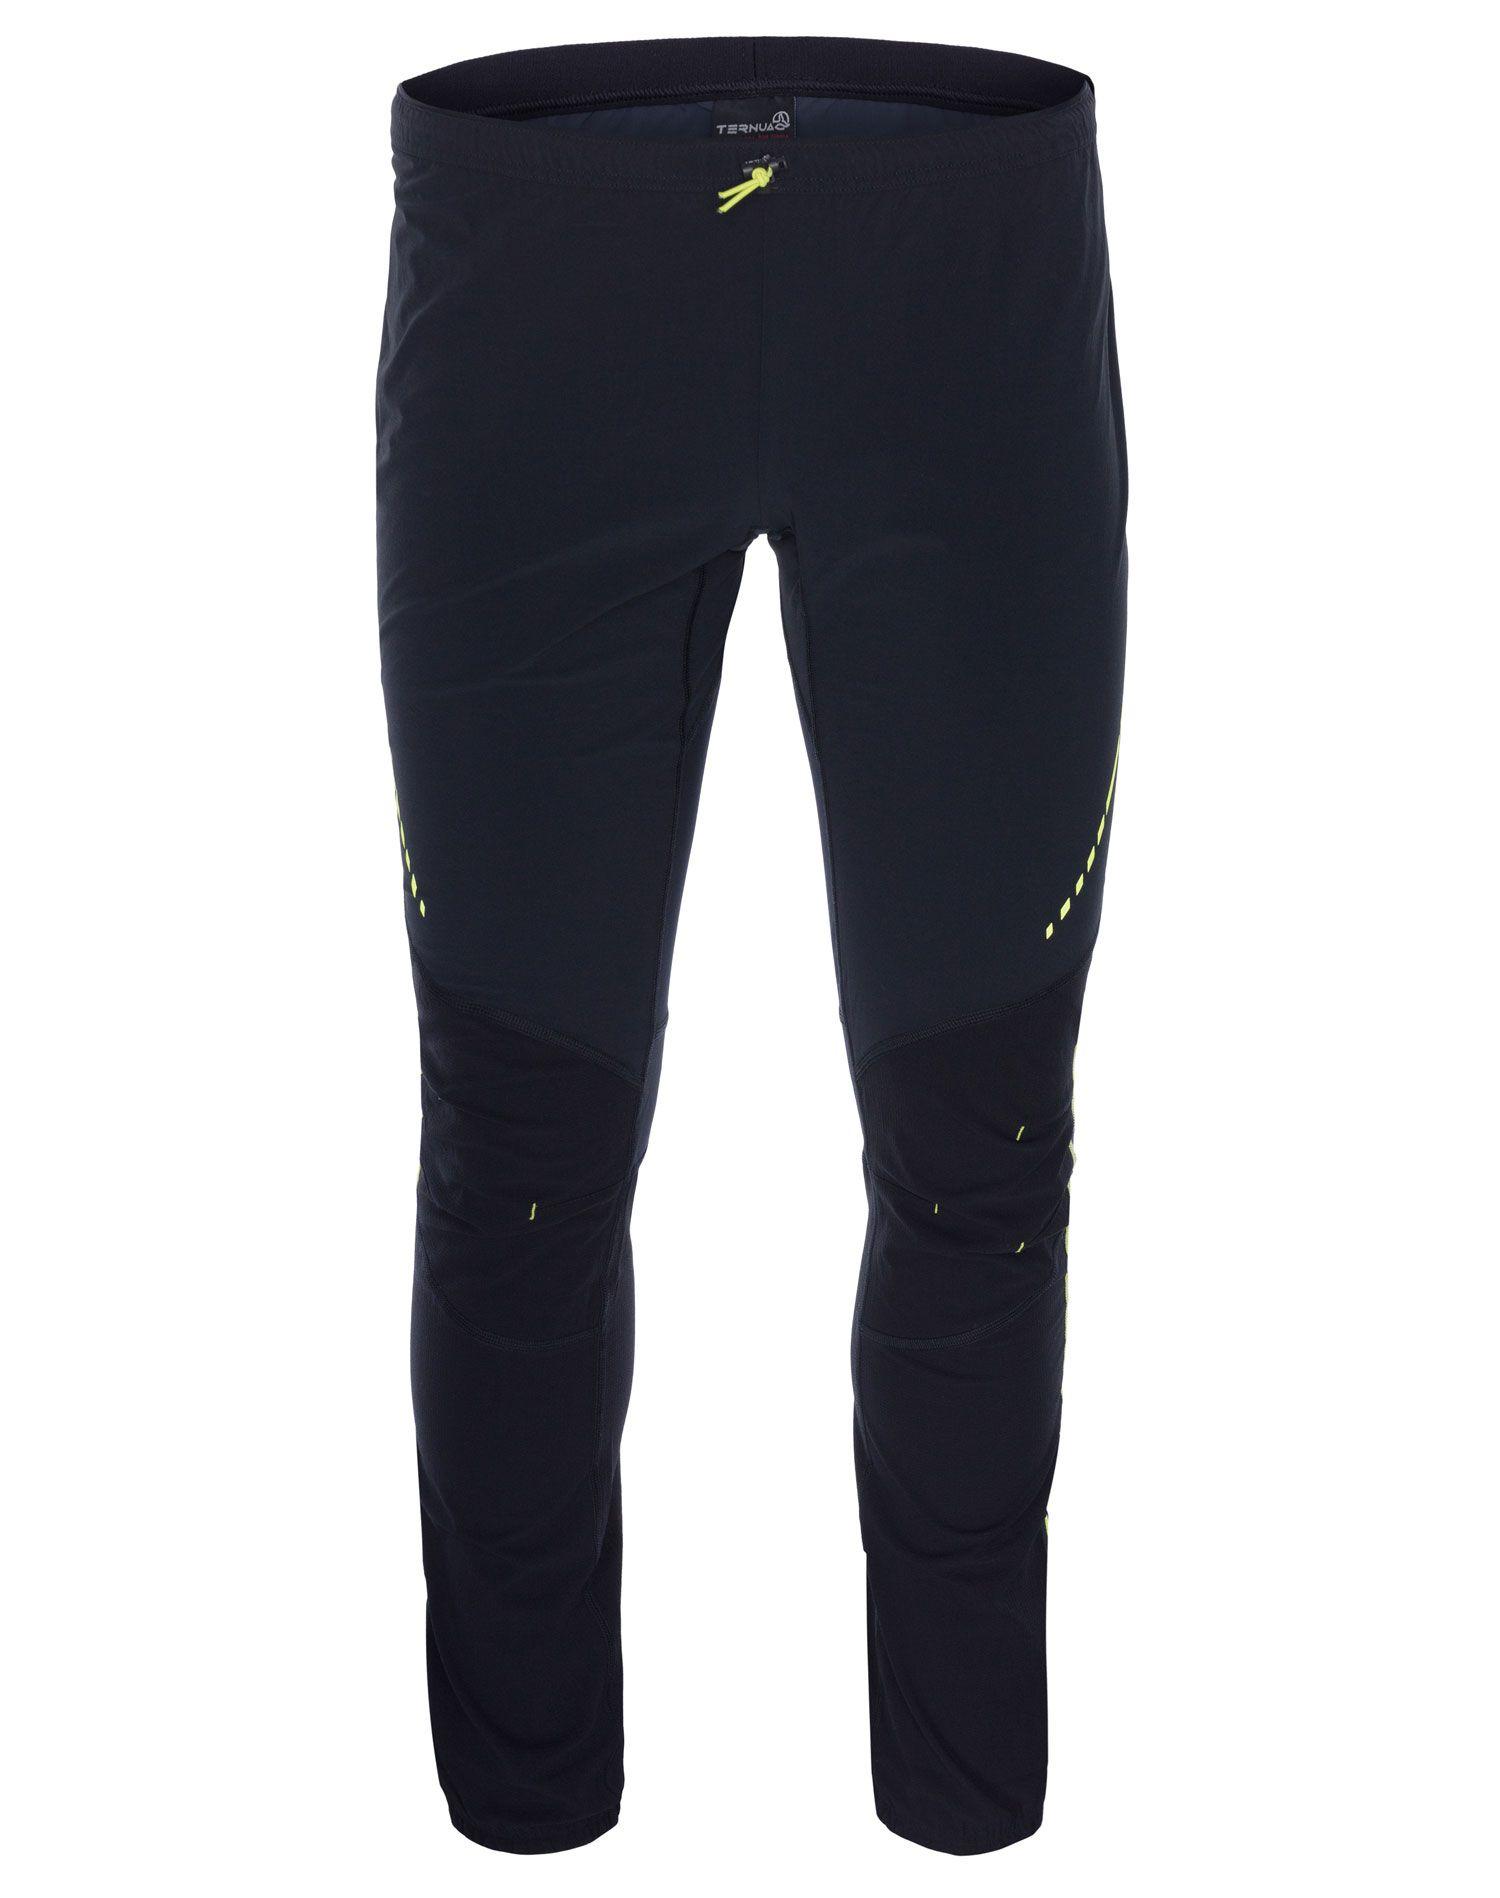 Ternua Stowe Pant - Sporthose - Herren